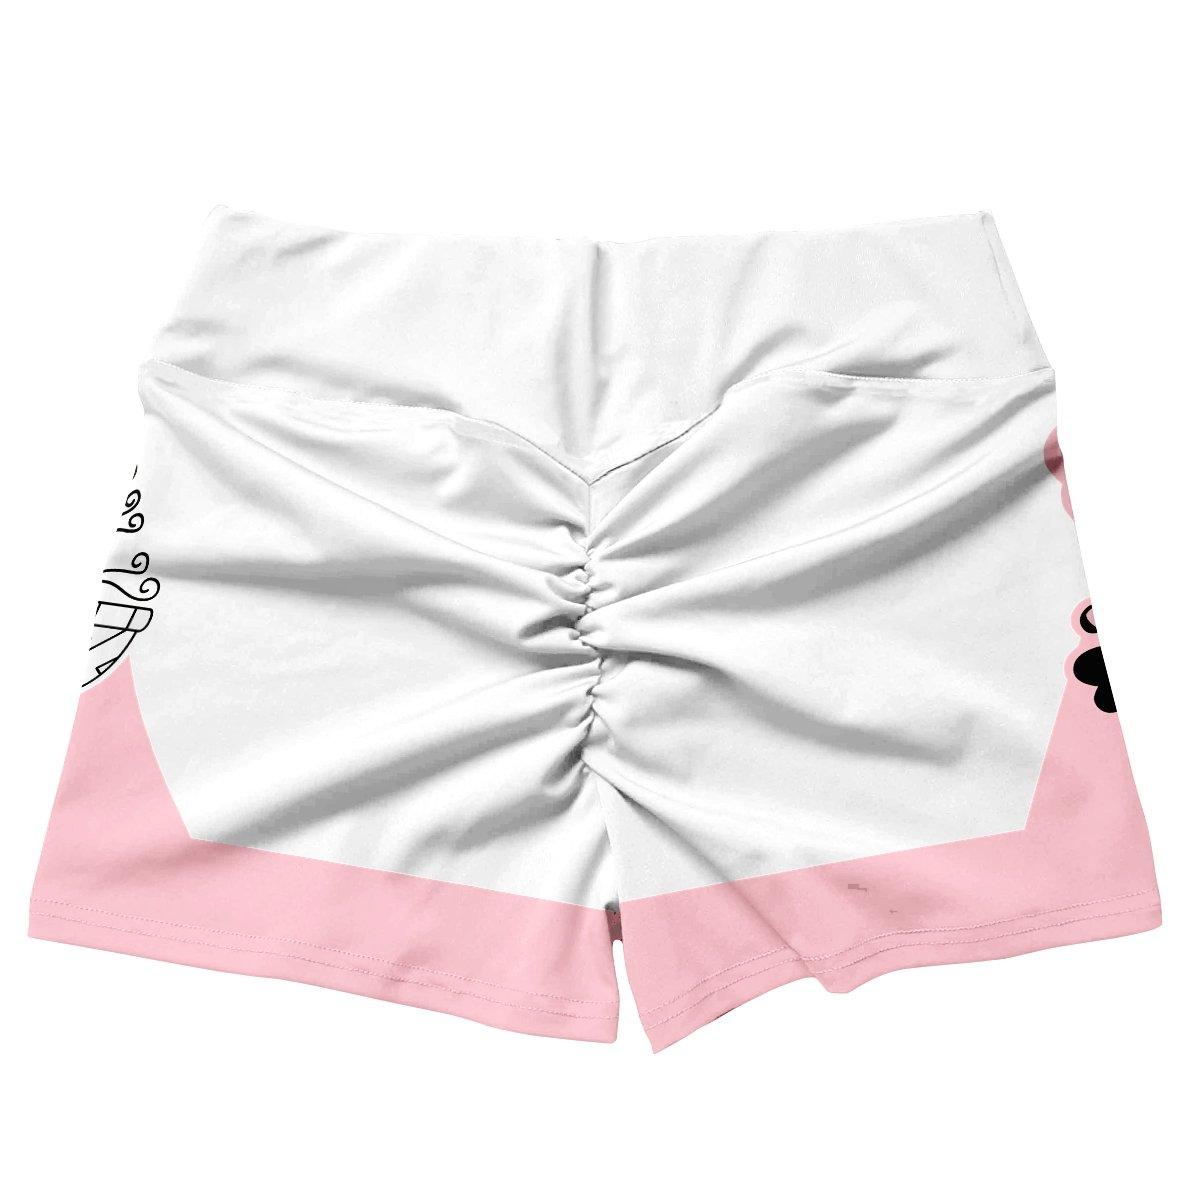 pokemon fairy uniform active wear set 309862 - Anime Swimsuits